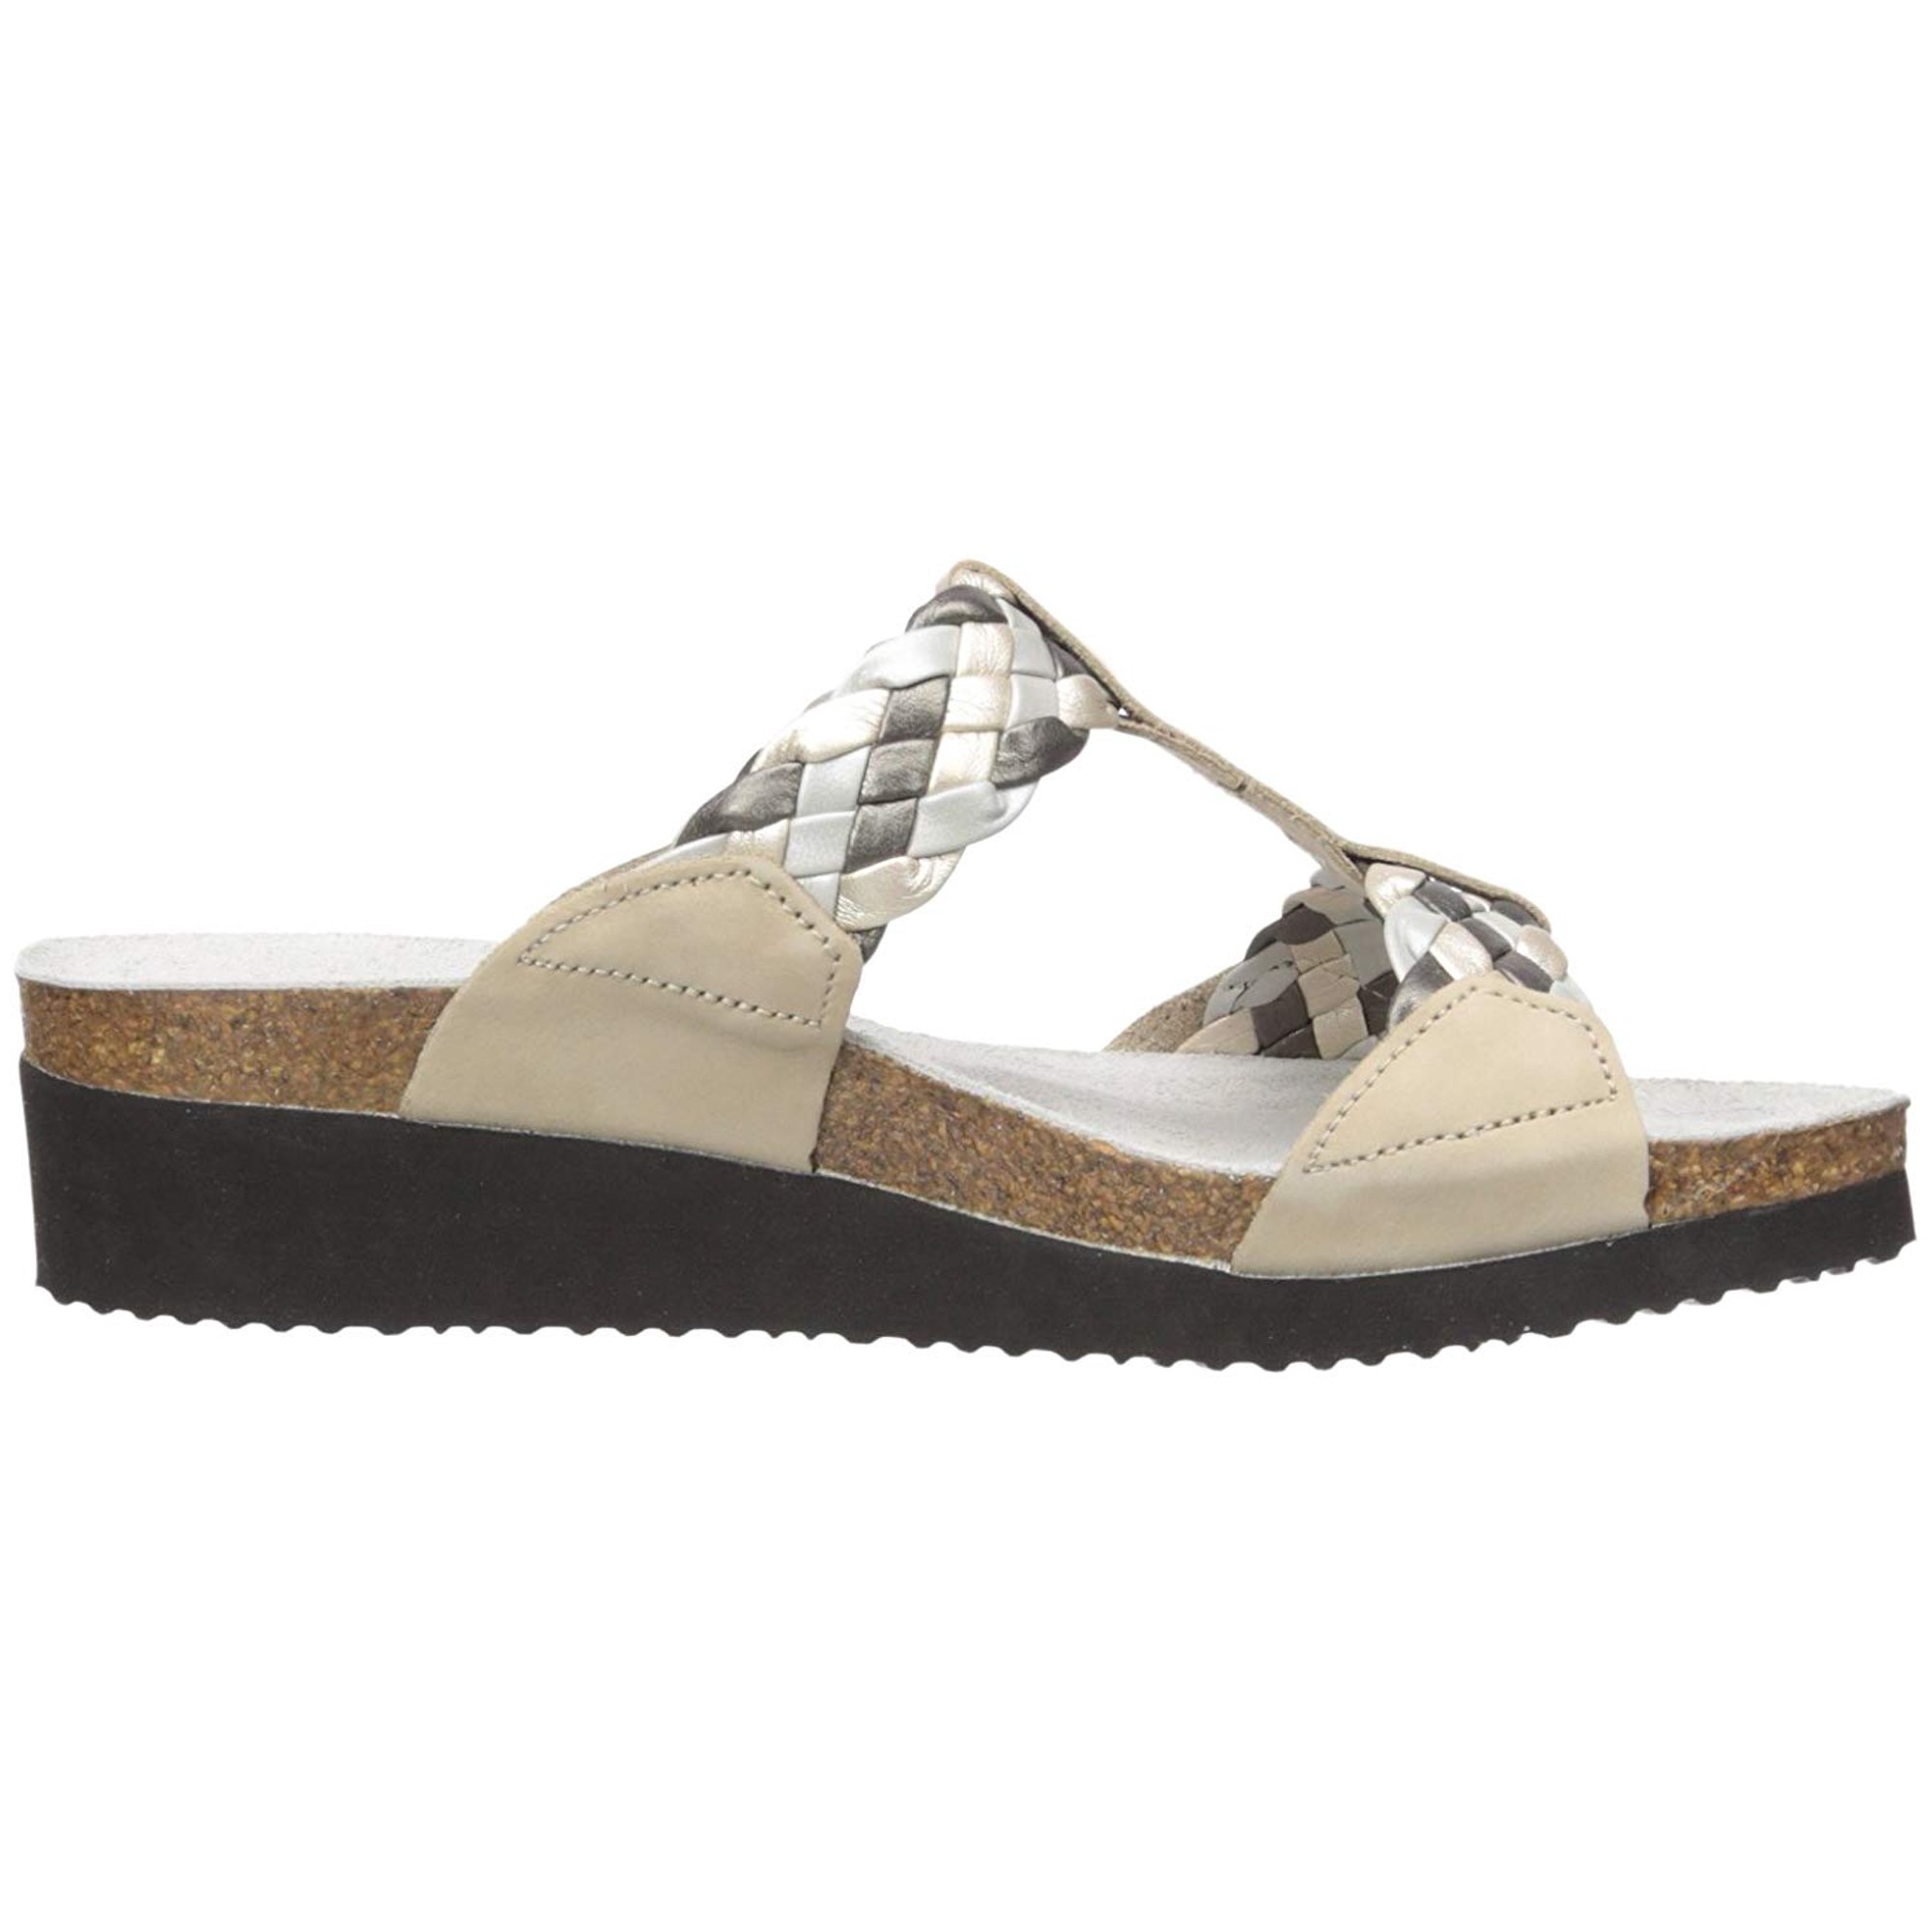 Casual Sandals Leather Womens Emilia Open Slide Toe Ara JT3lcFK1